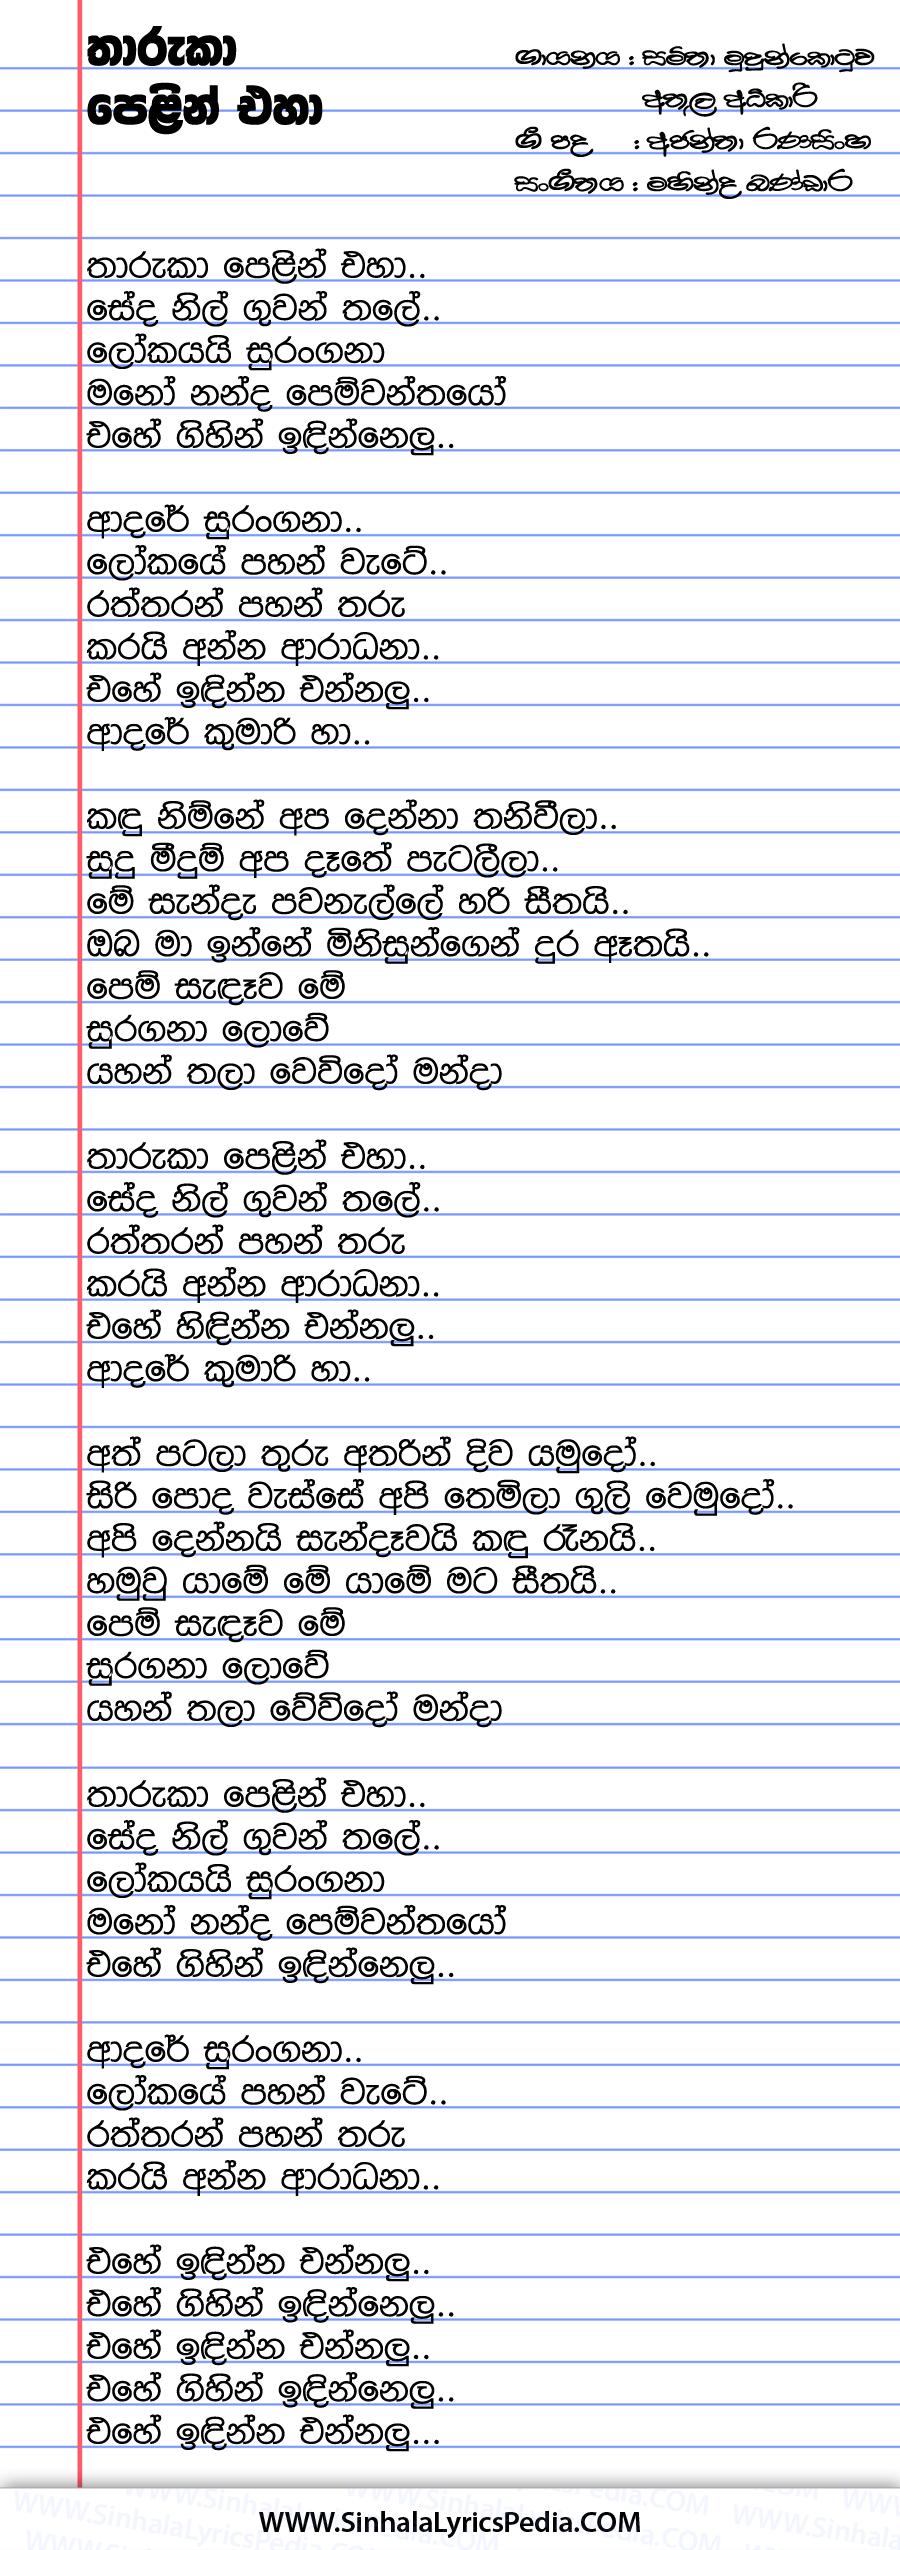 Tharuka Pelin Eha Song Lyrics